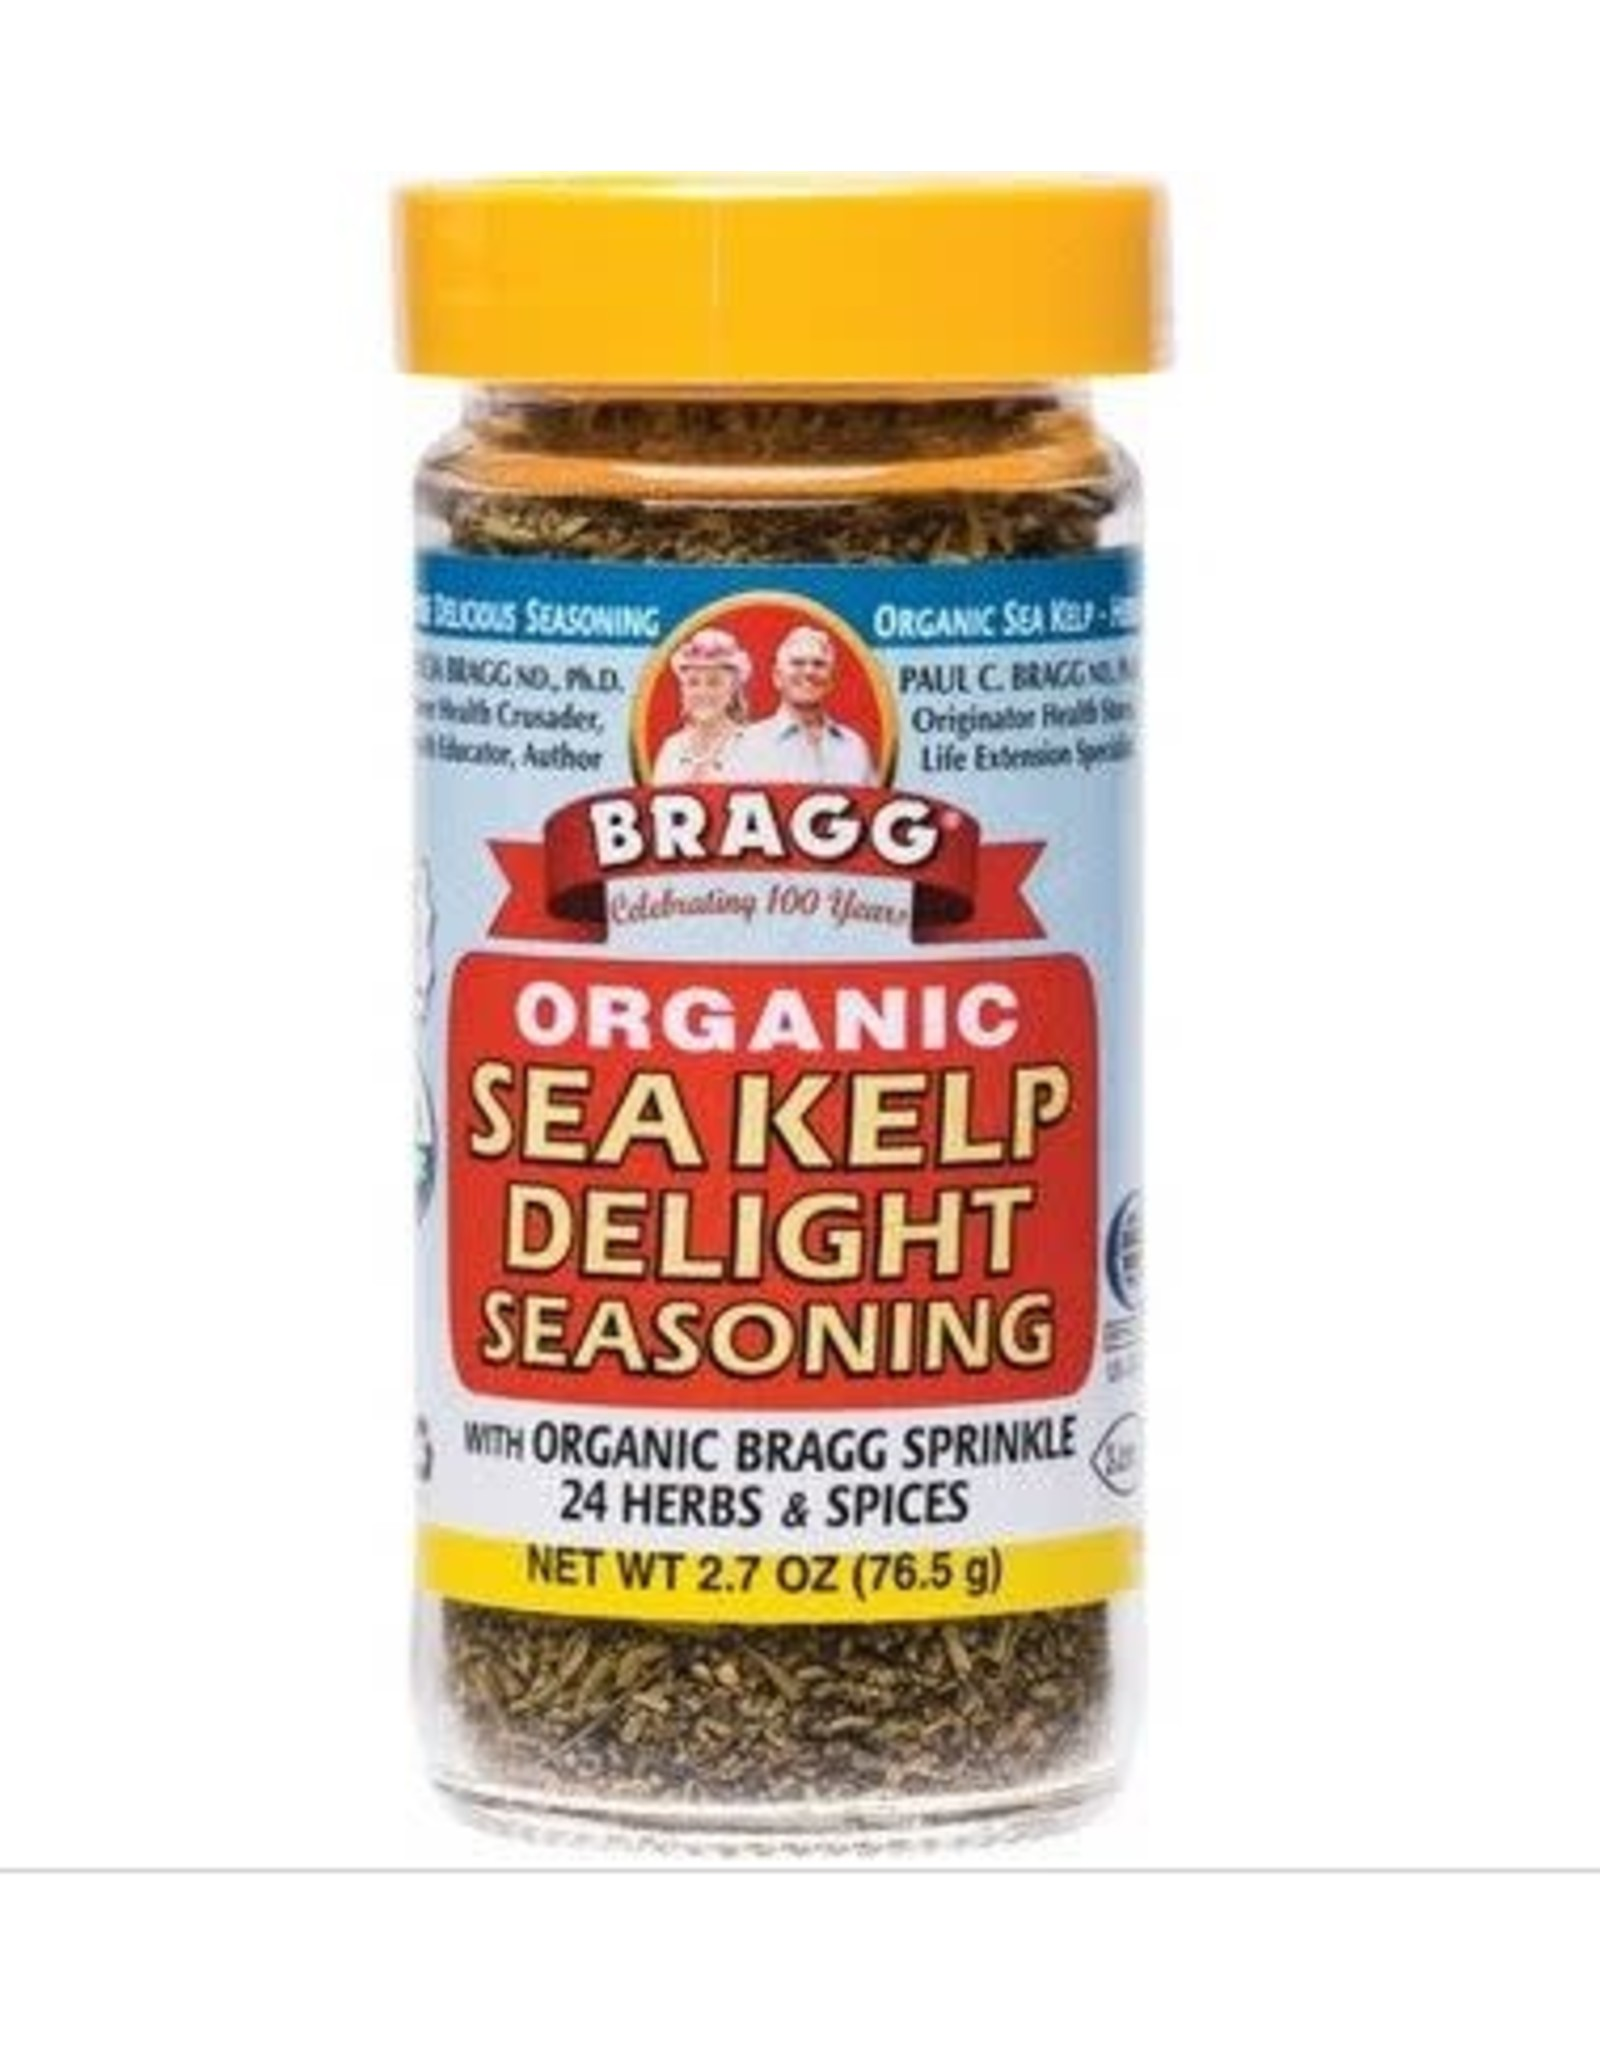 Bragg Seasoning Organic Sea Kelp Delight 42.5g